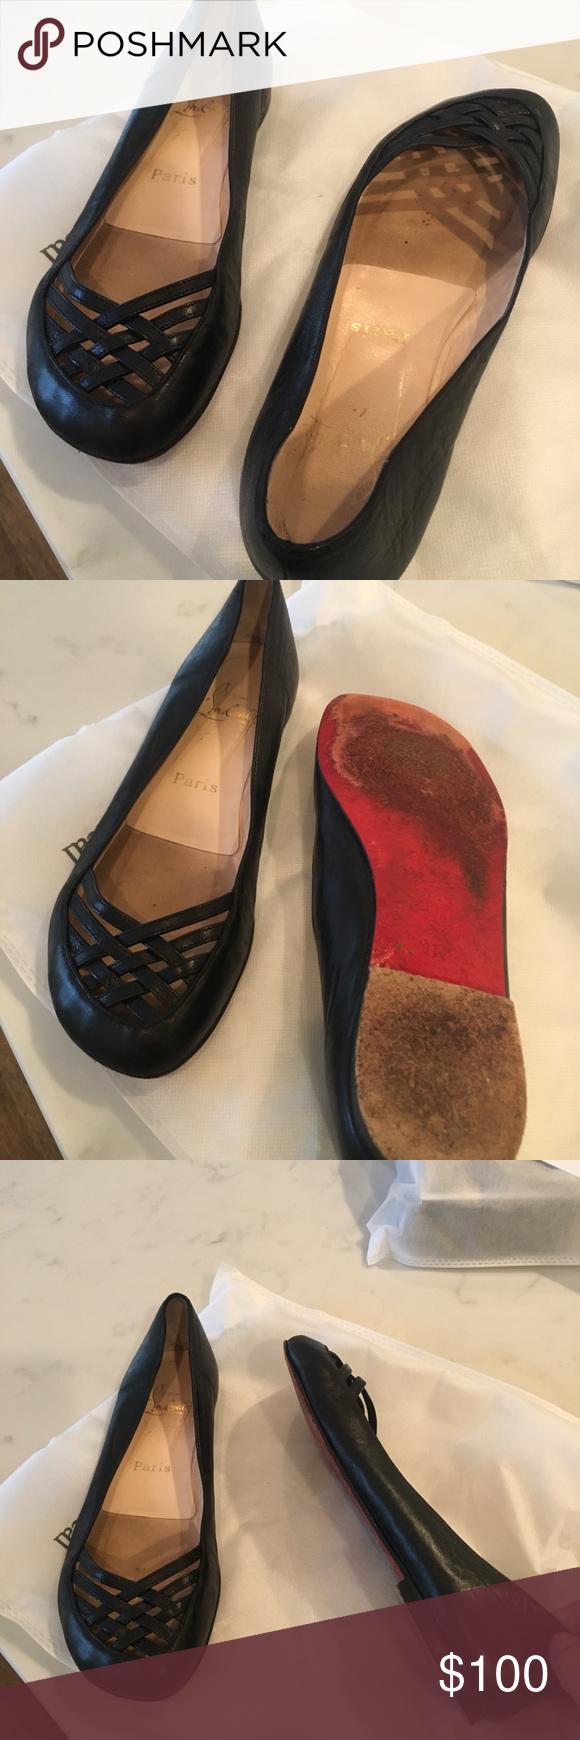 dc421ff3039 Christian louboutin flats- Good condition - most comfortable Christian  louboutin shoes Christian Louboutin Shoes Flats   Loafers